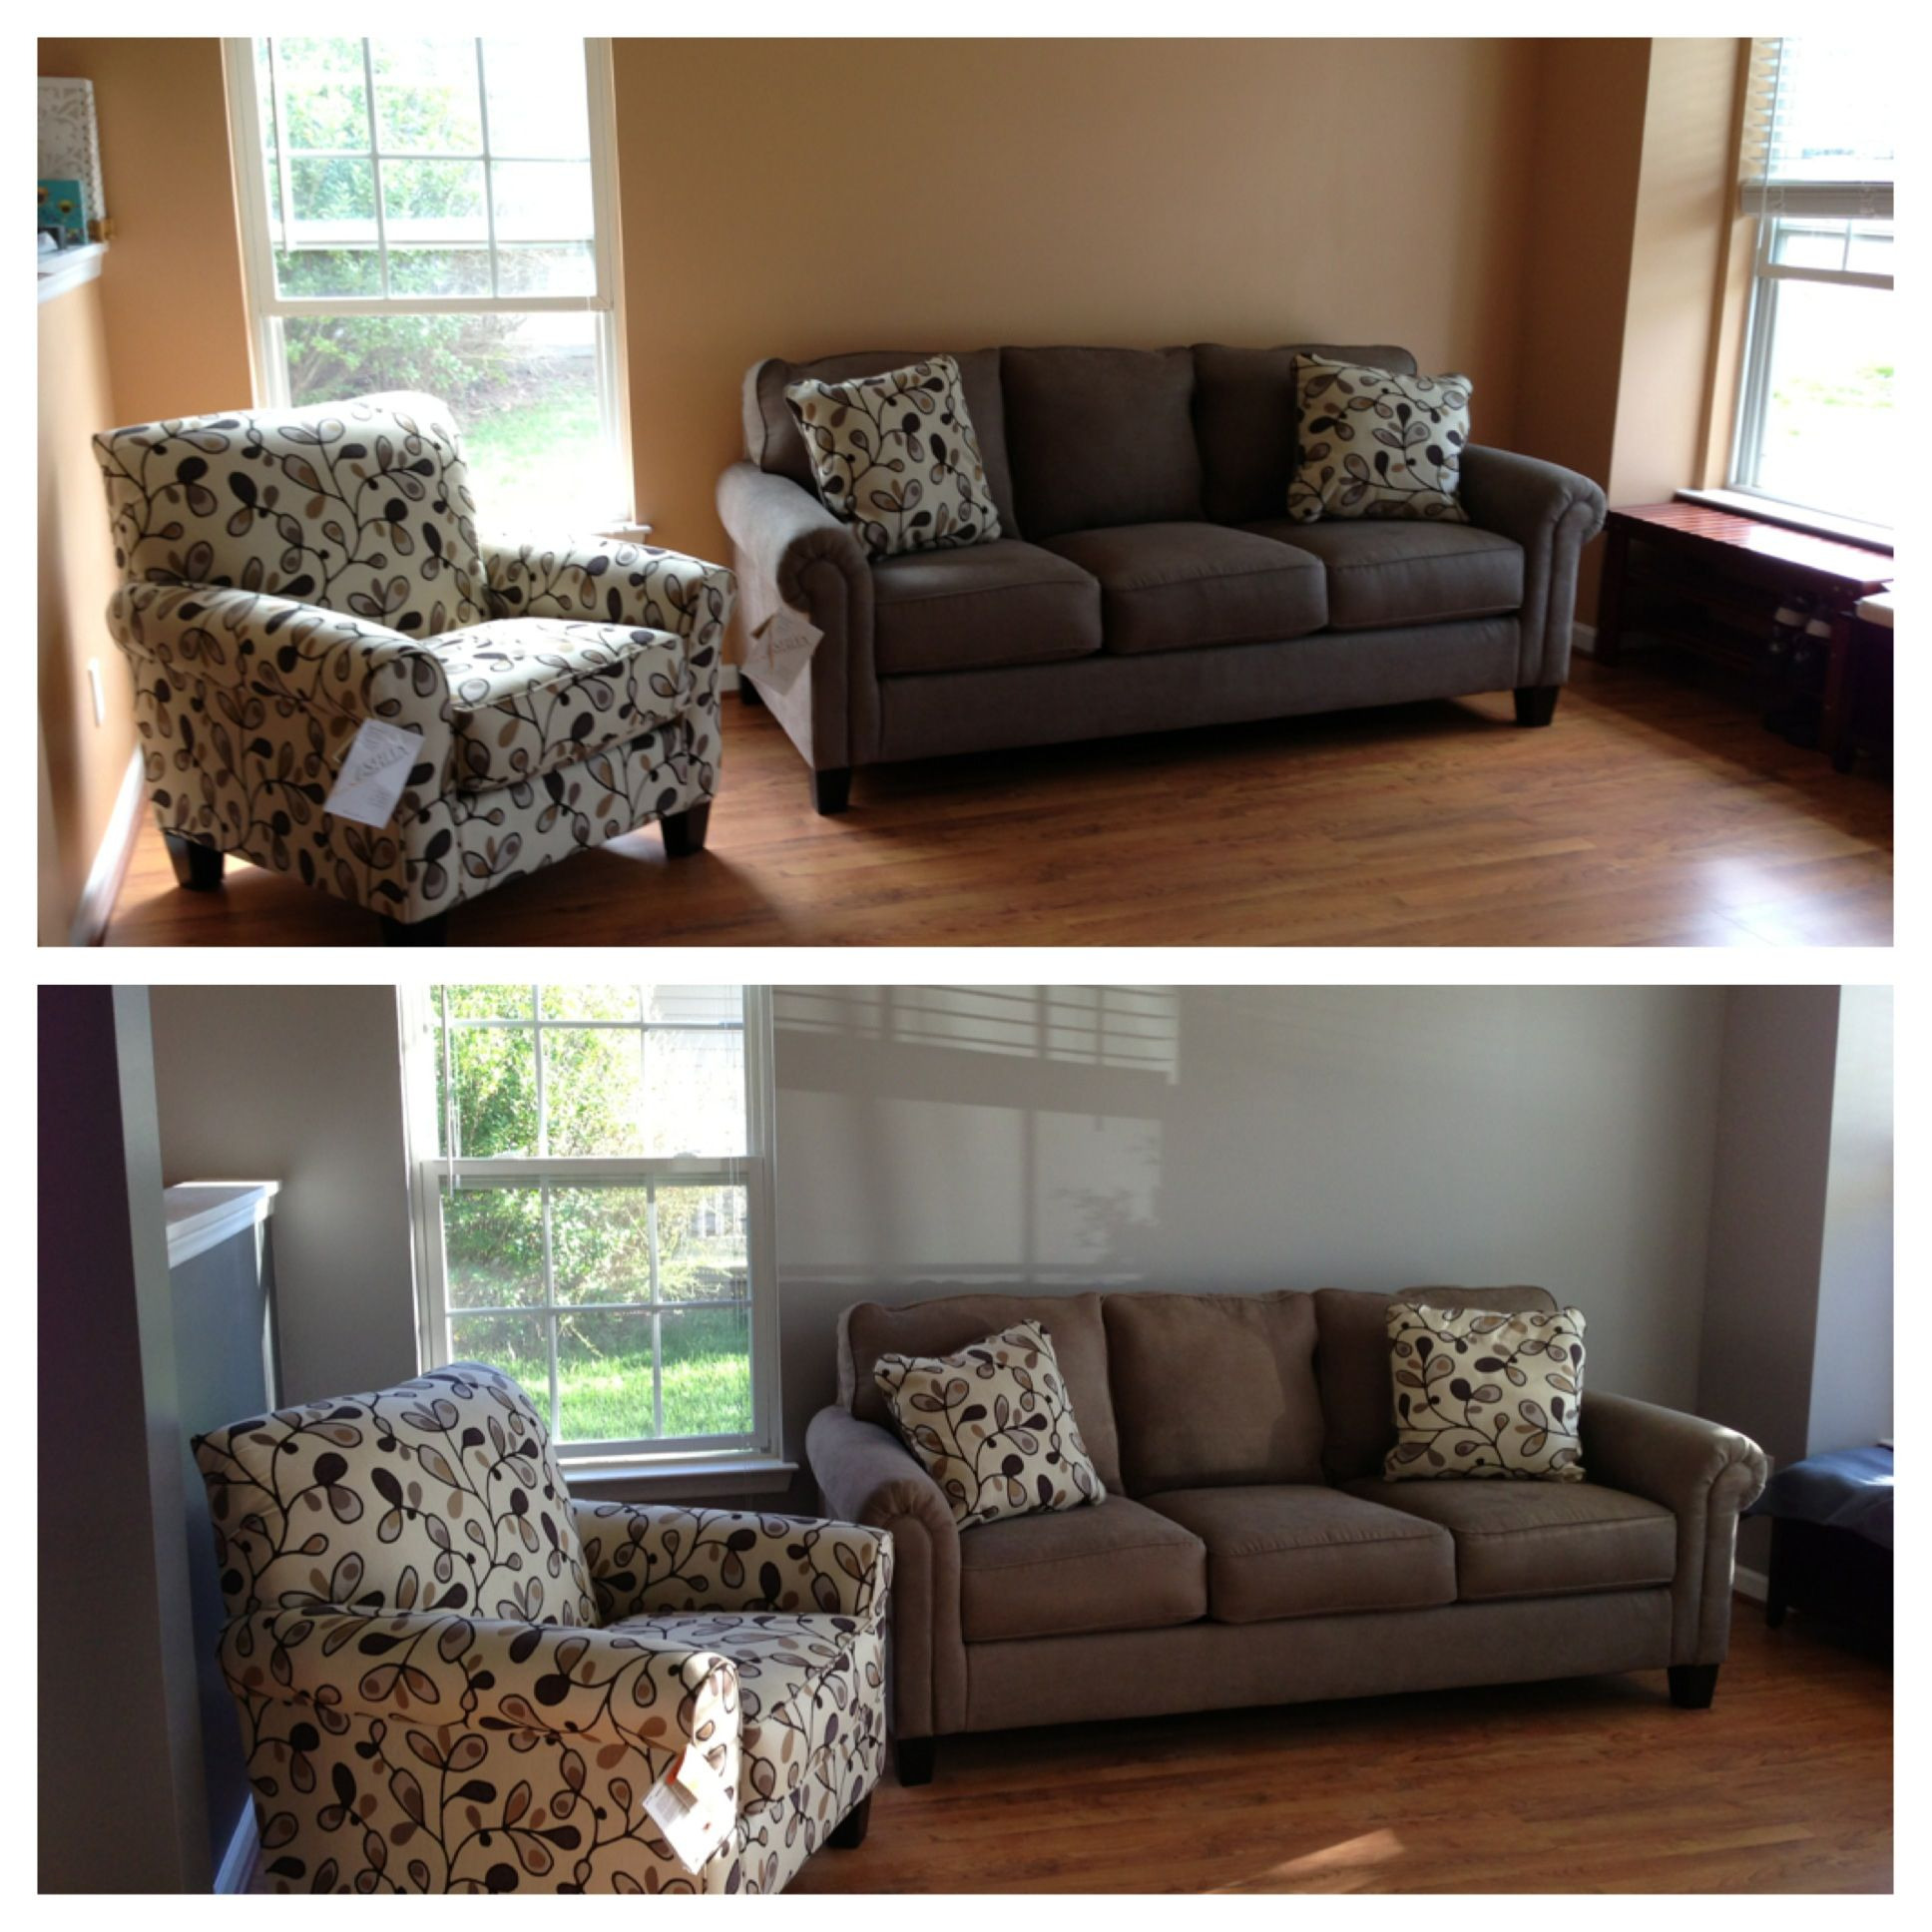 Bedroom Before And After Pictures Bedroom Colors Photos Bedroom Tv Unit Color Schemes For Bedroom: Nasty Ugly Orange Beige